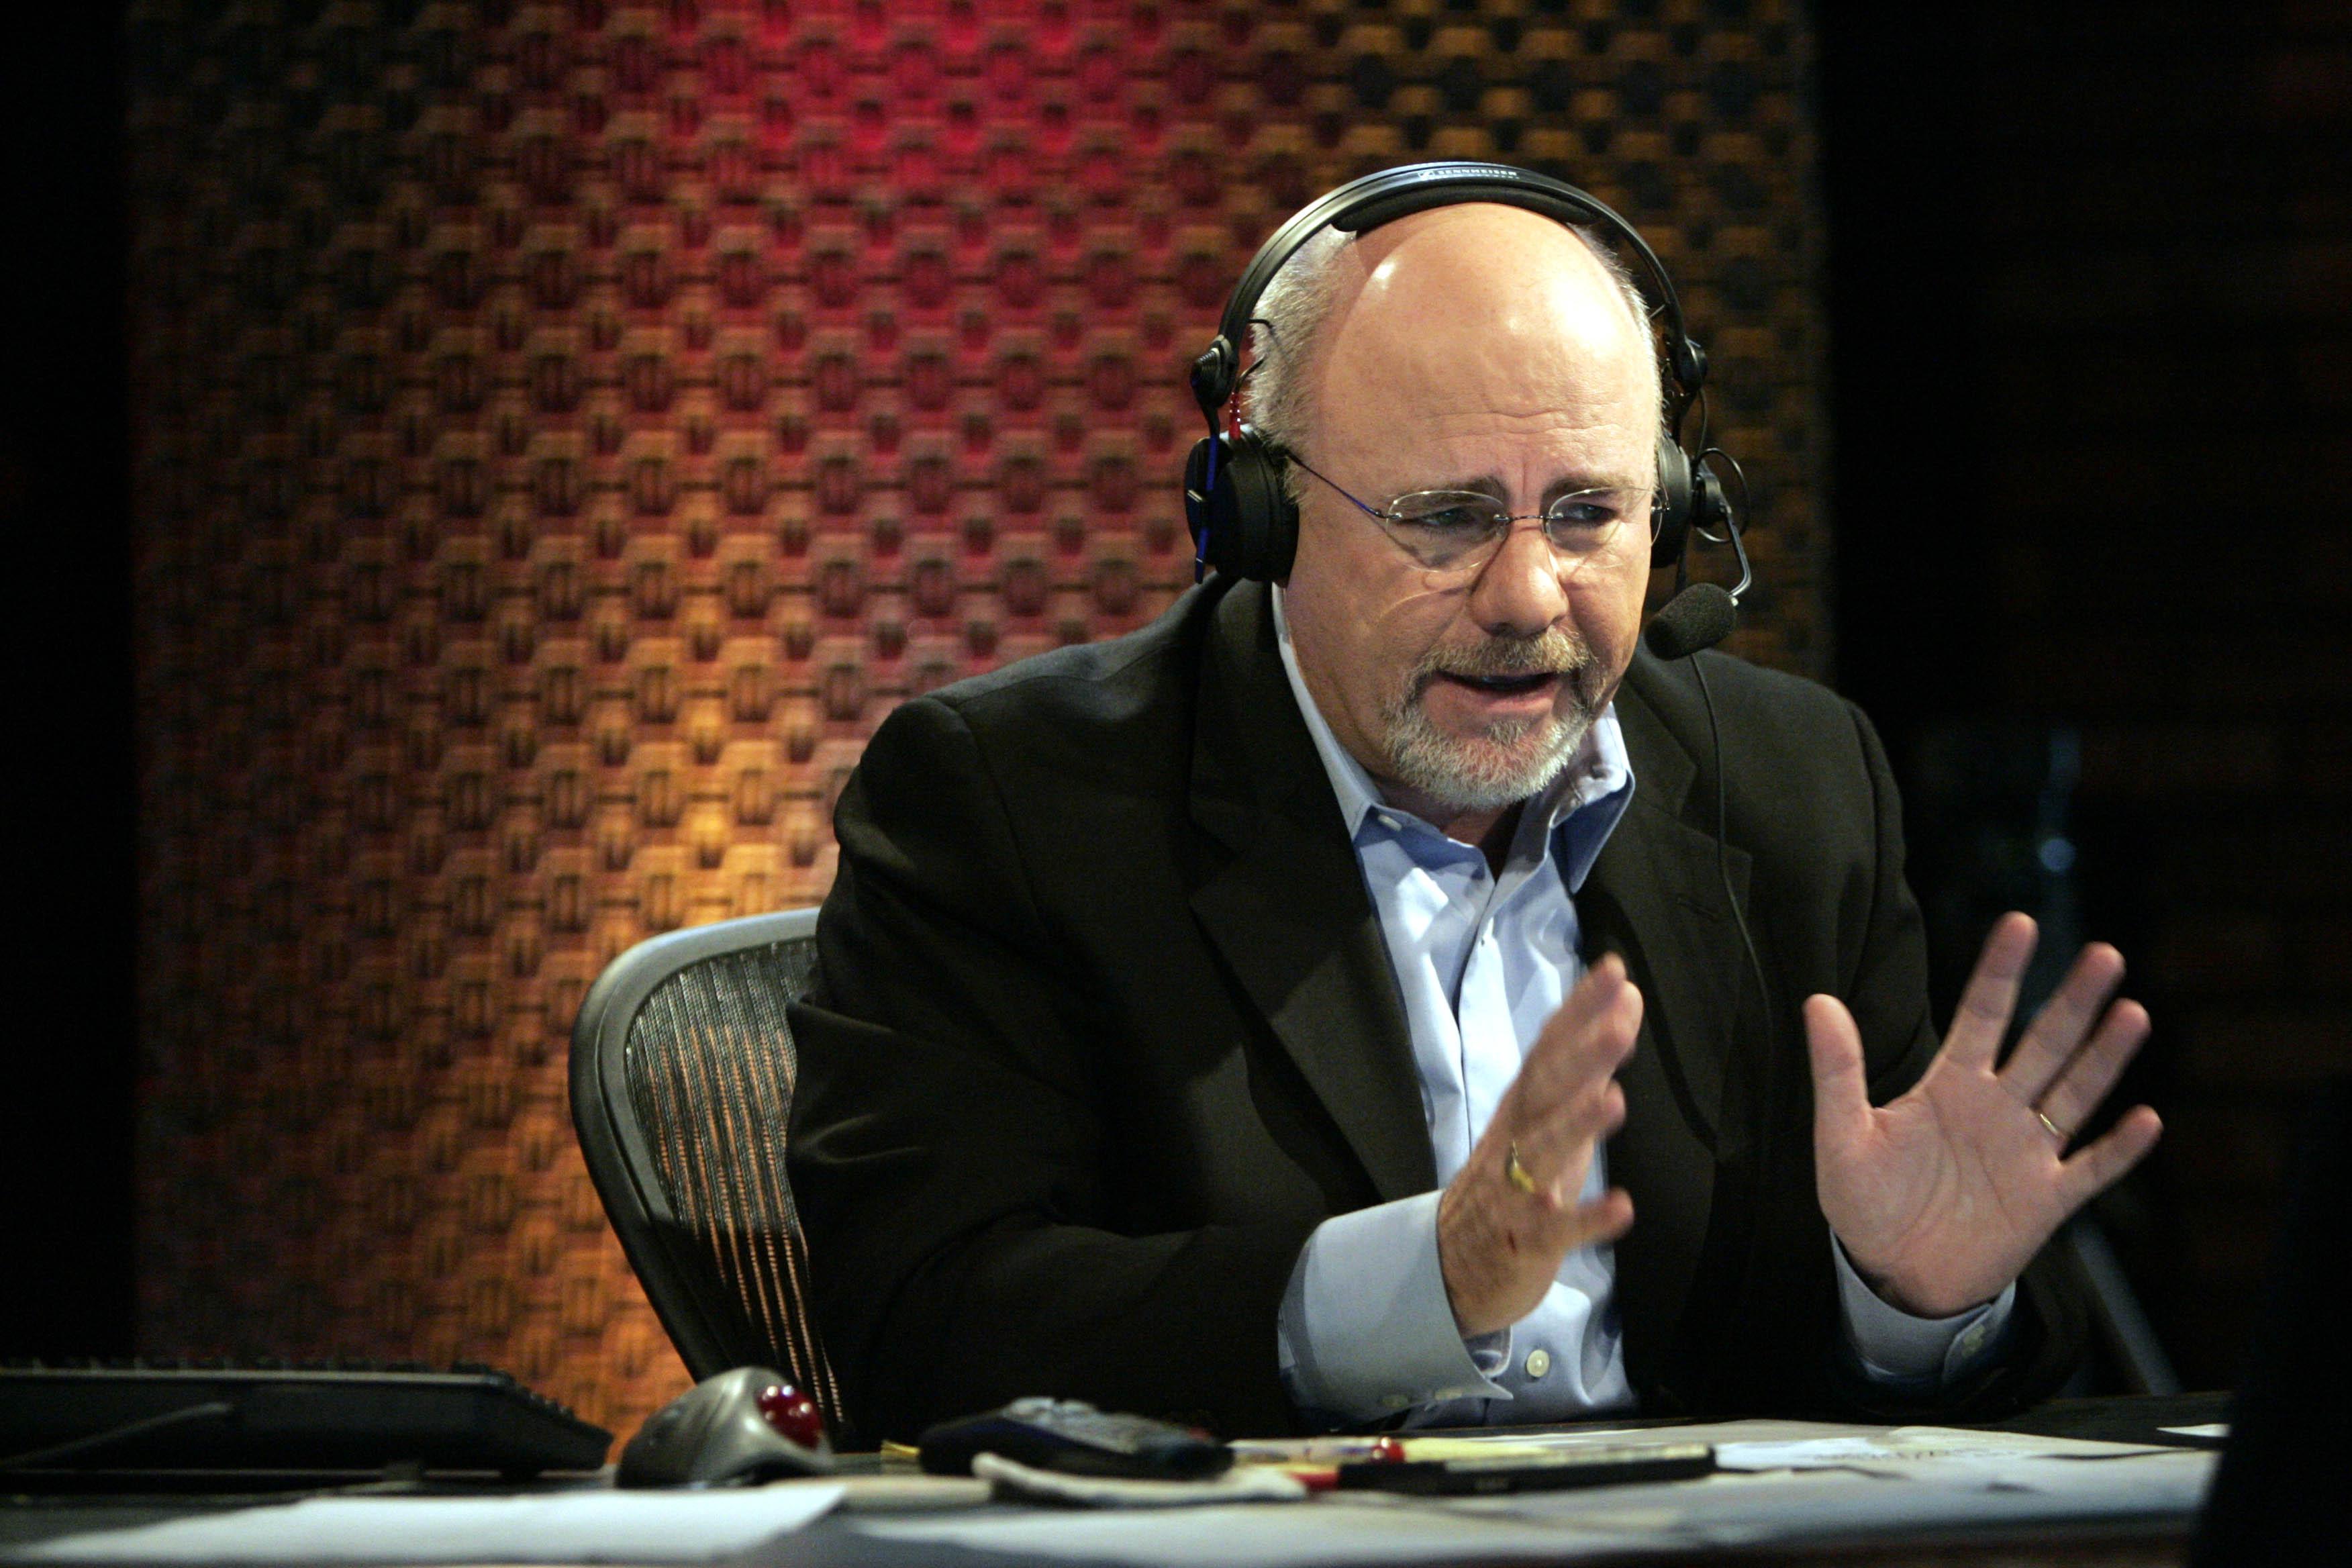 Dave ramsey endorsed car dealer - Dave Ramsey Endorsed Car Dealer 37